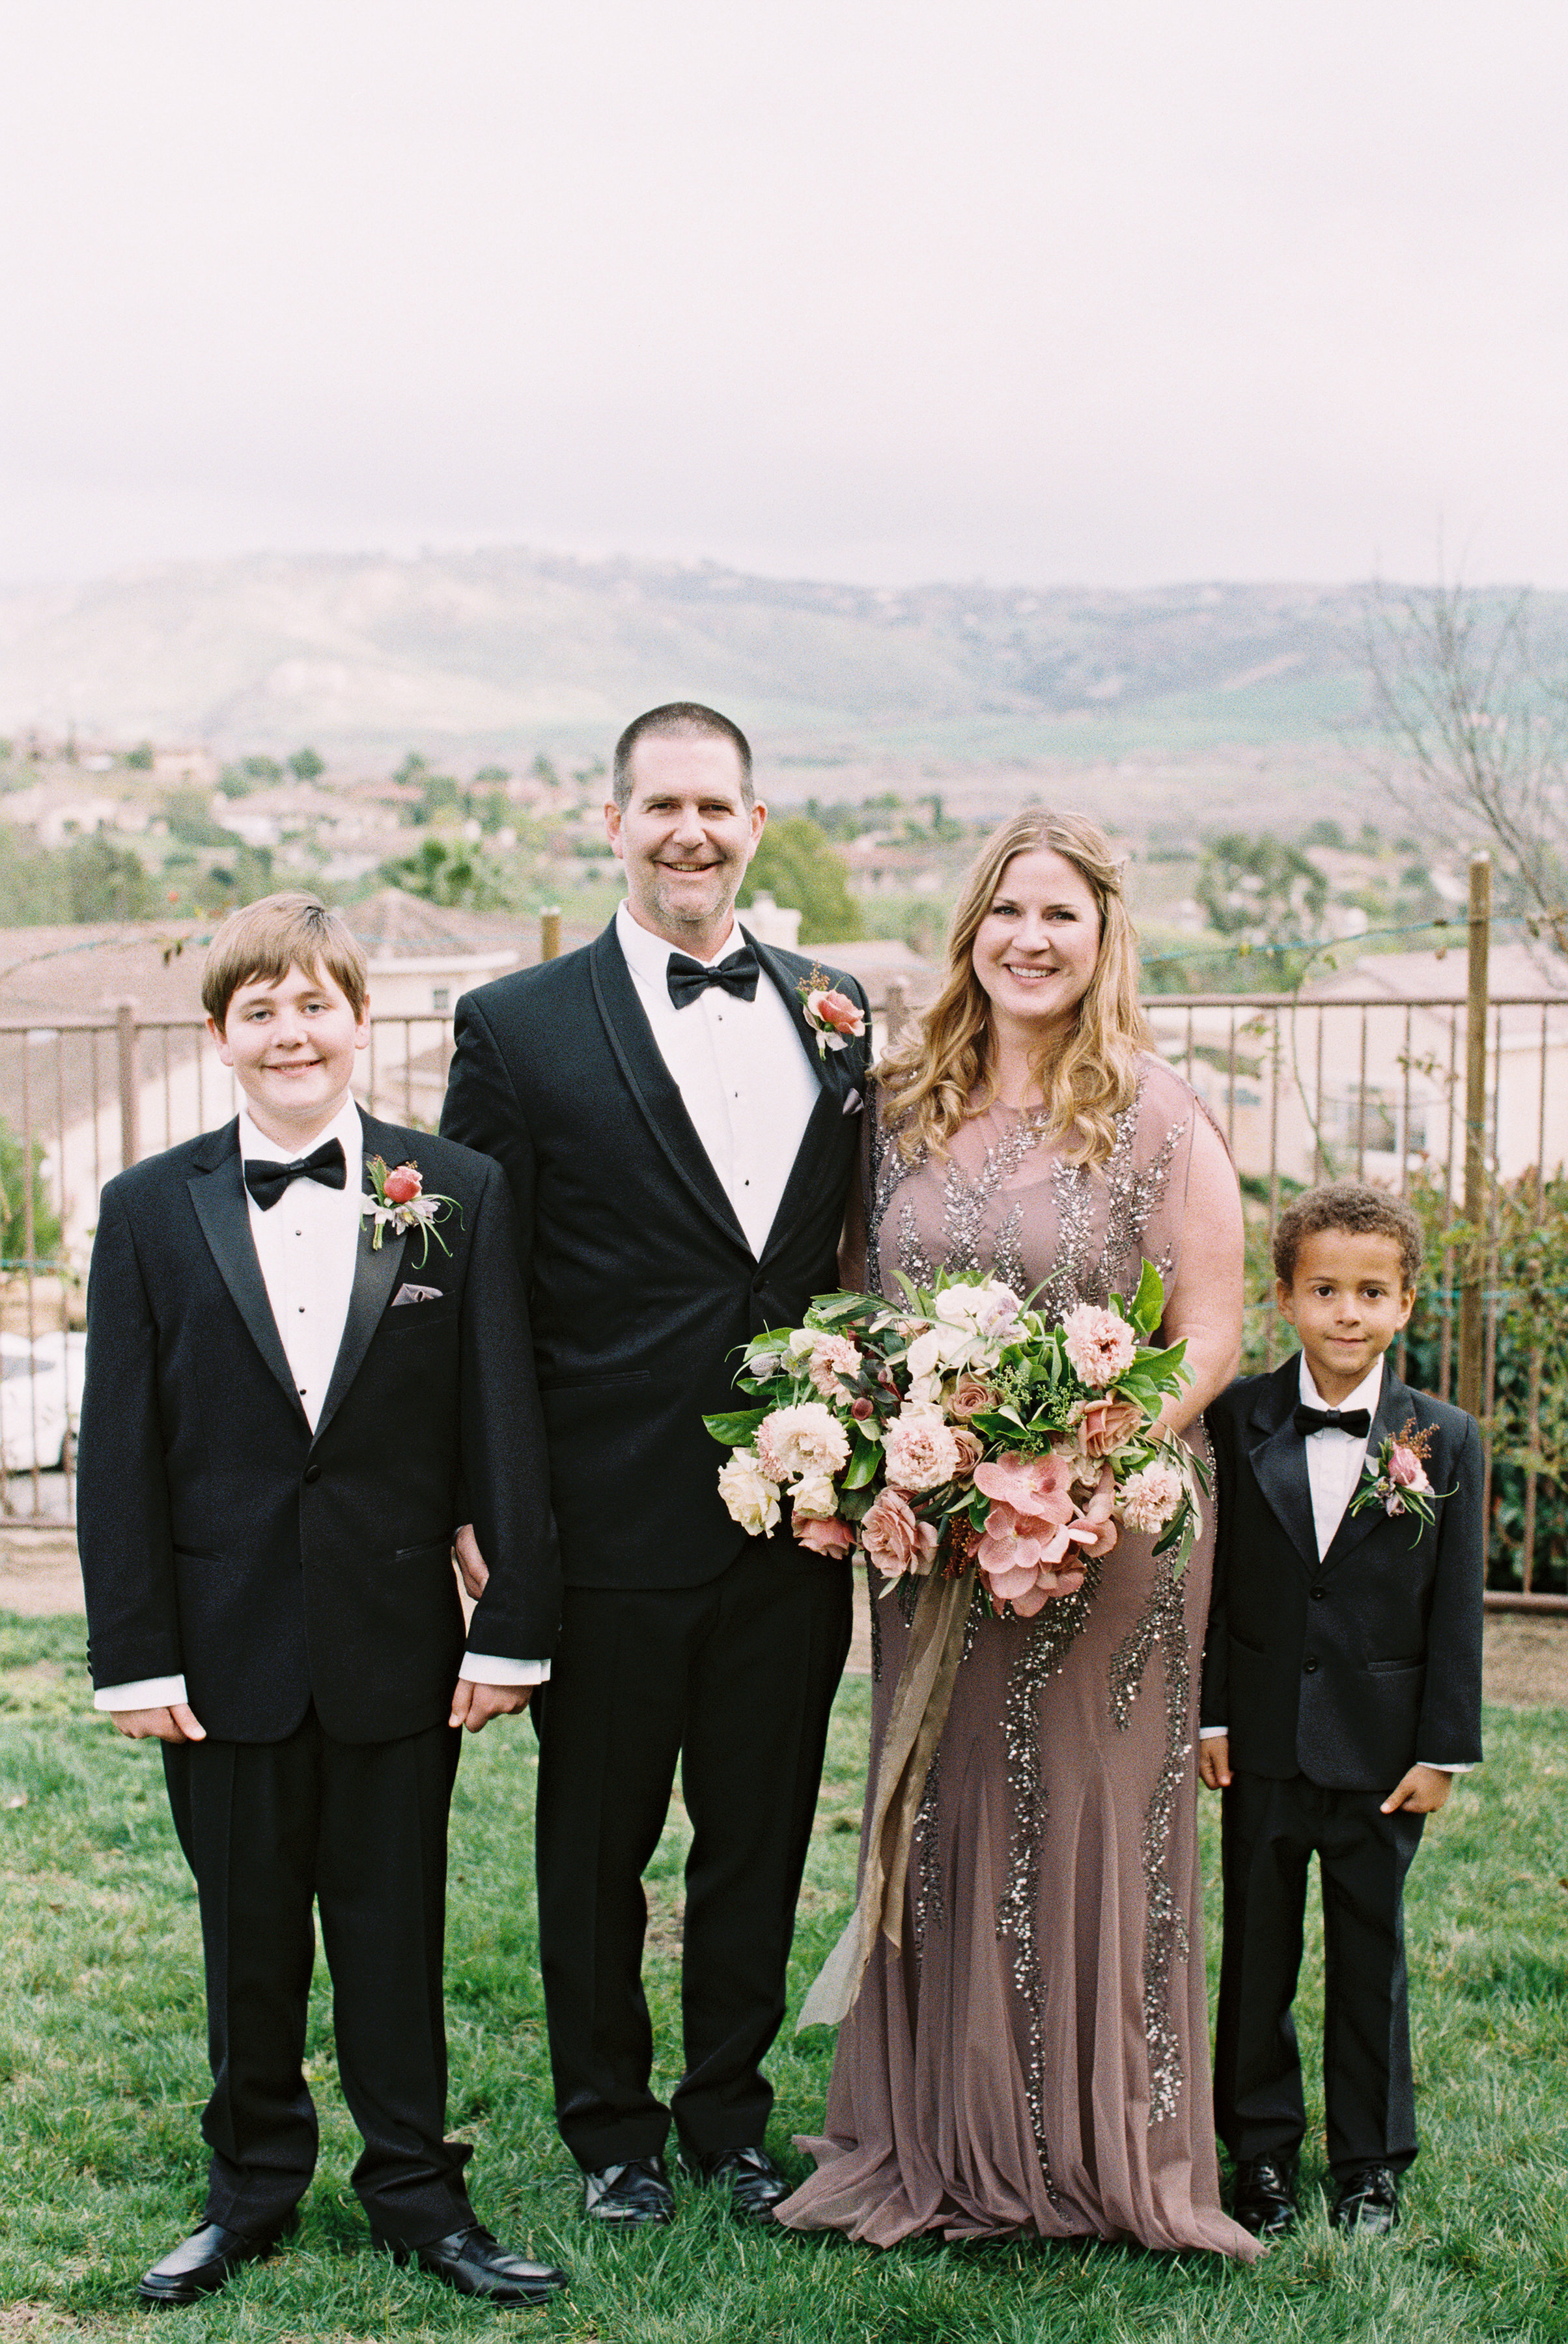 surprise wedding couple family two boys